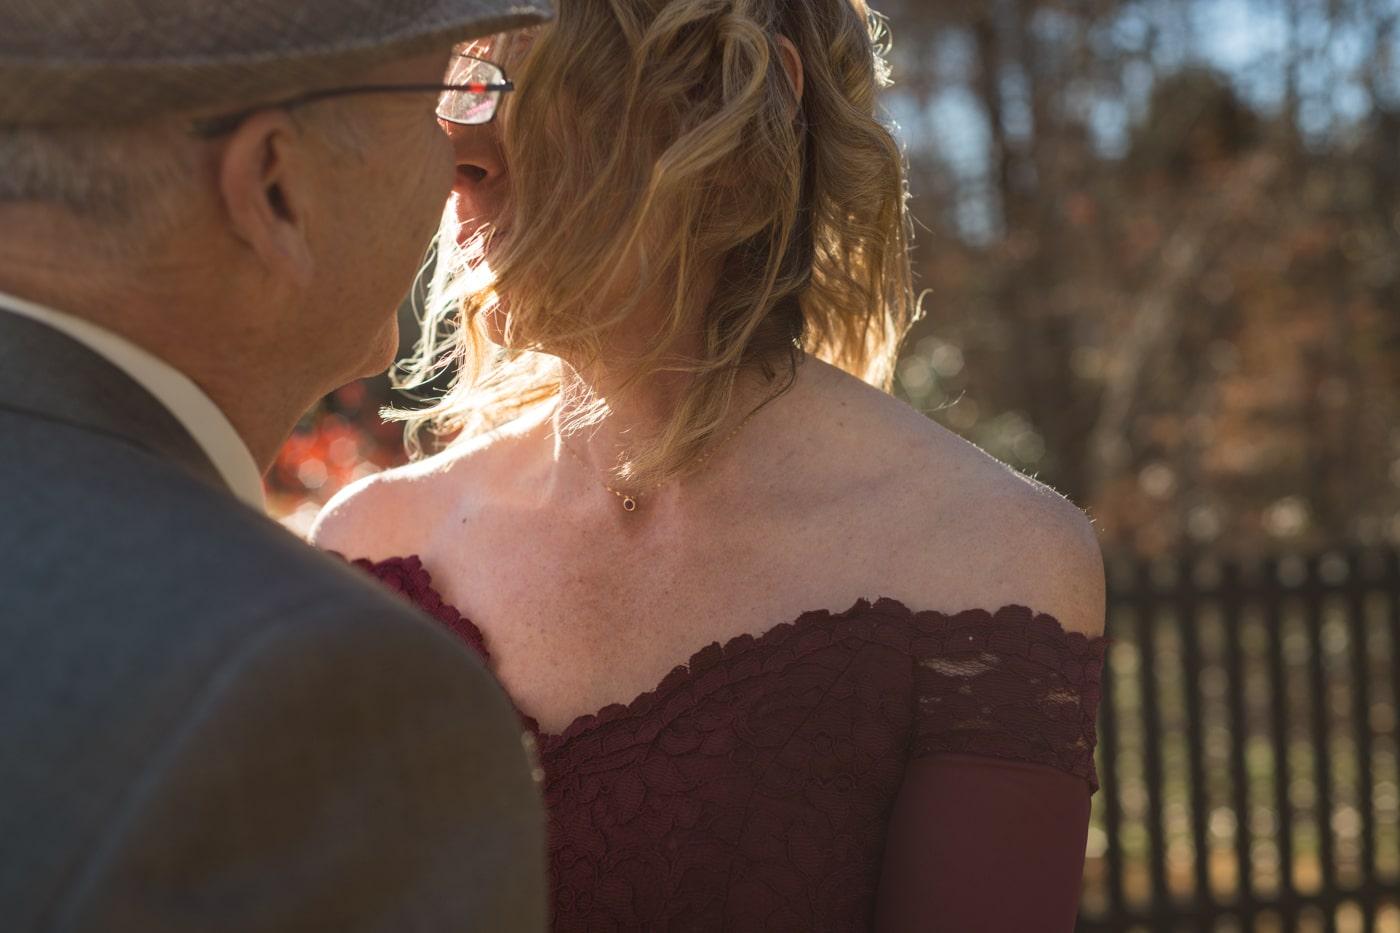 newlyweds pose touching noses in backyard